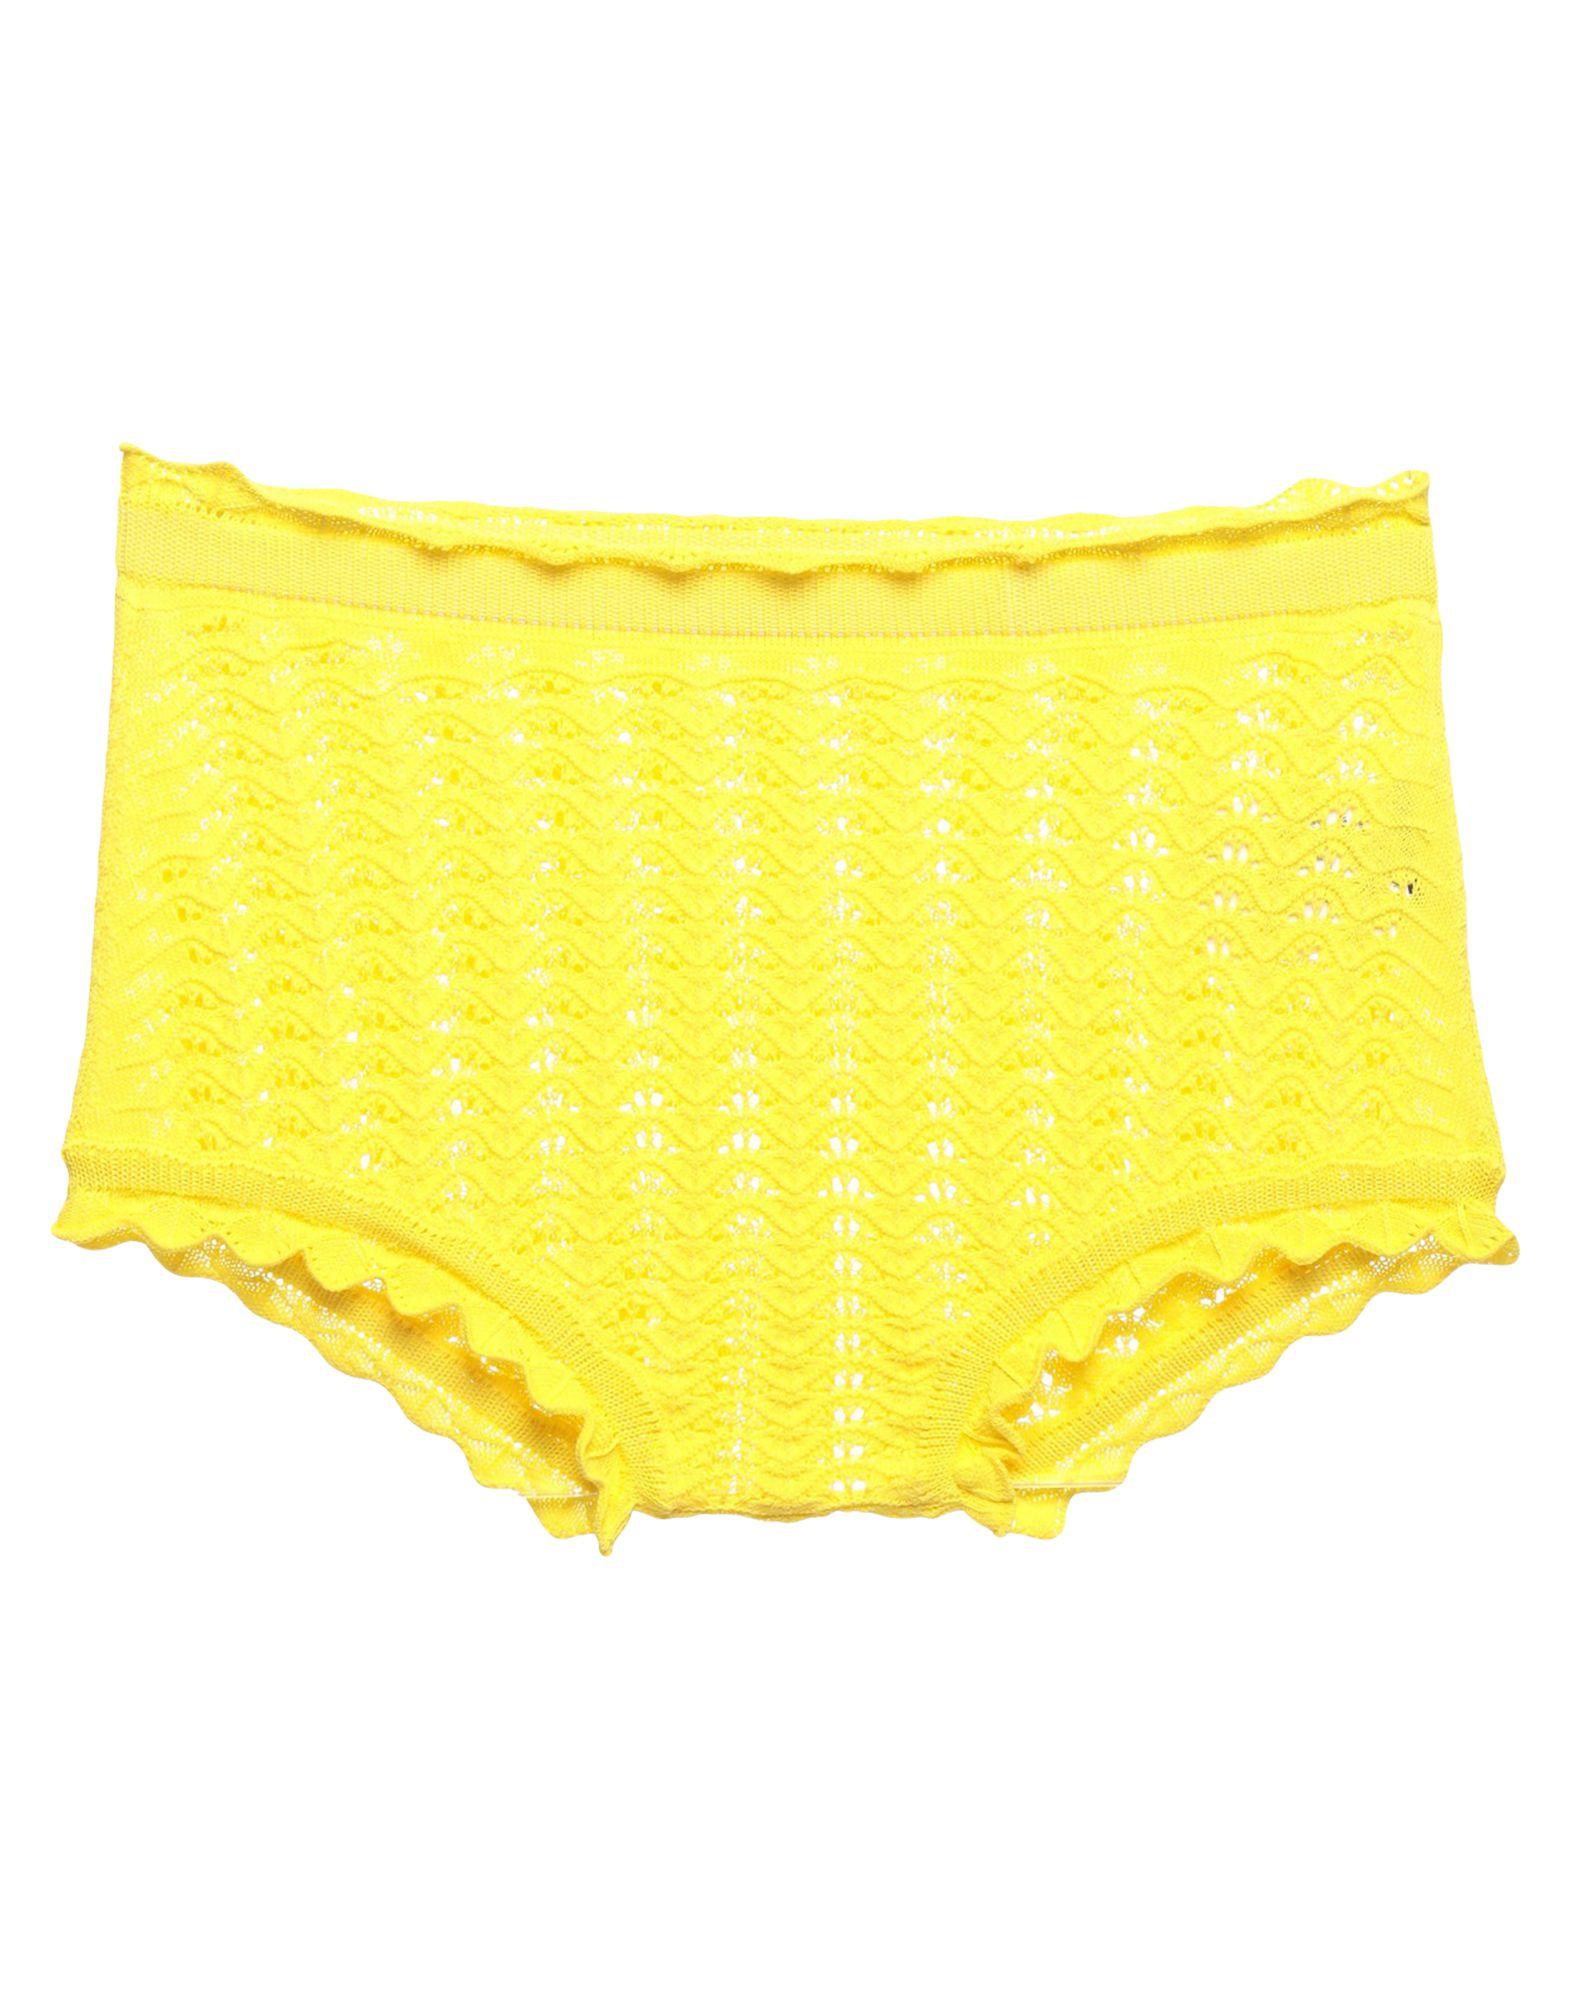 JIL SANDER Boyshorts. knitted, no appliqués, lightweight sweater, basic solid color, elasticized waist. 100% Cotton